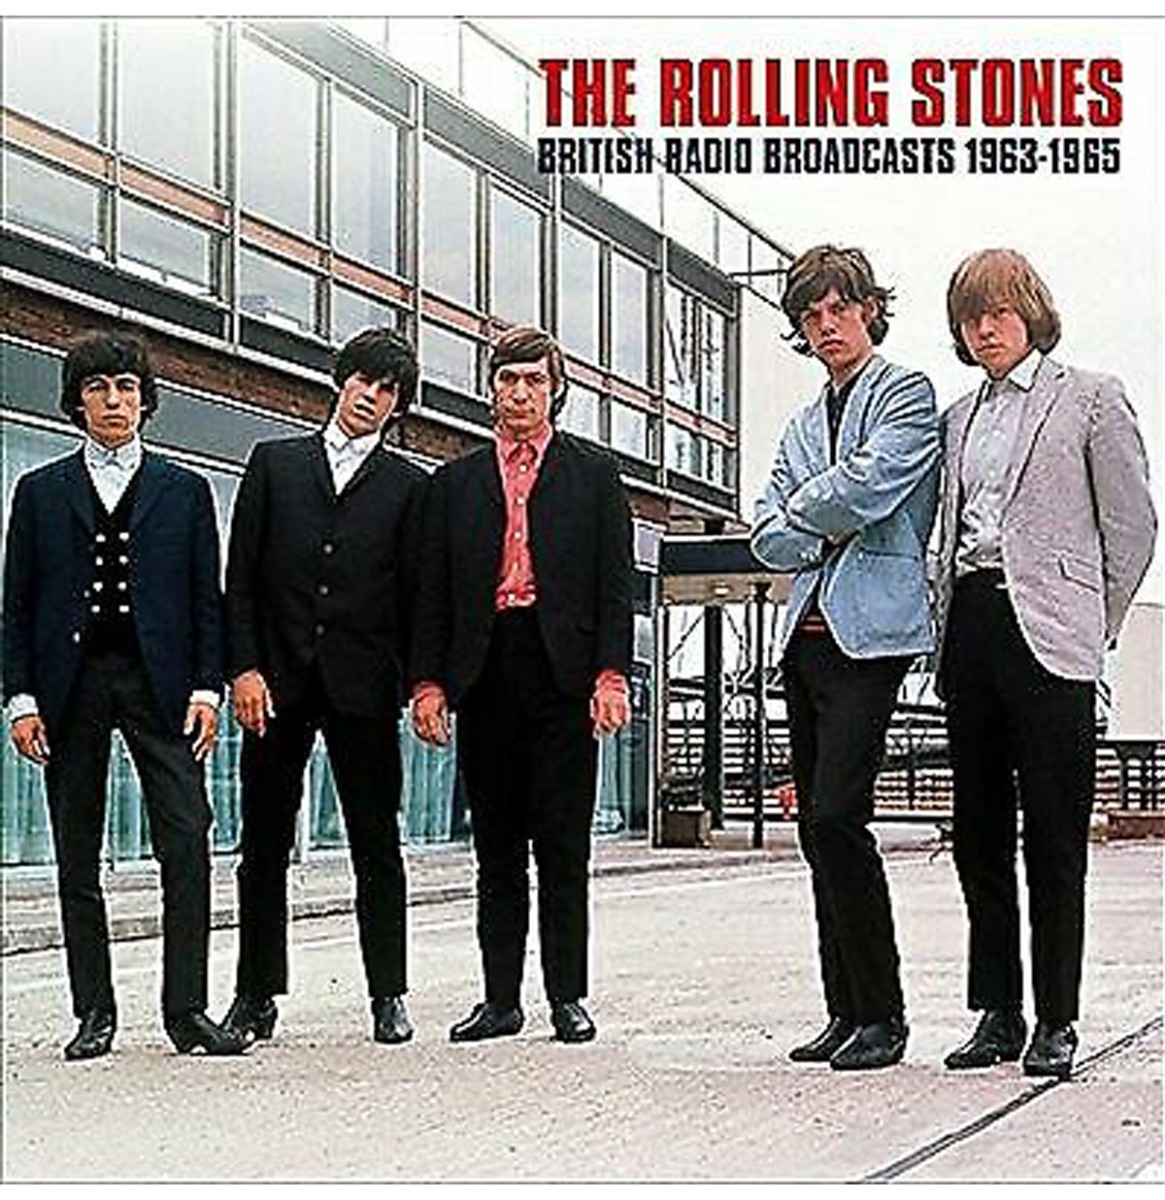 Fiftiesstore The Rolling Stones - British Radio Broadcast 1963-1965 LP